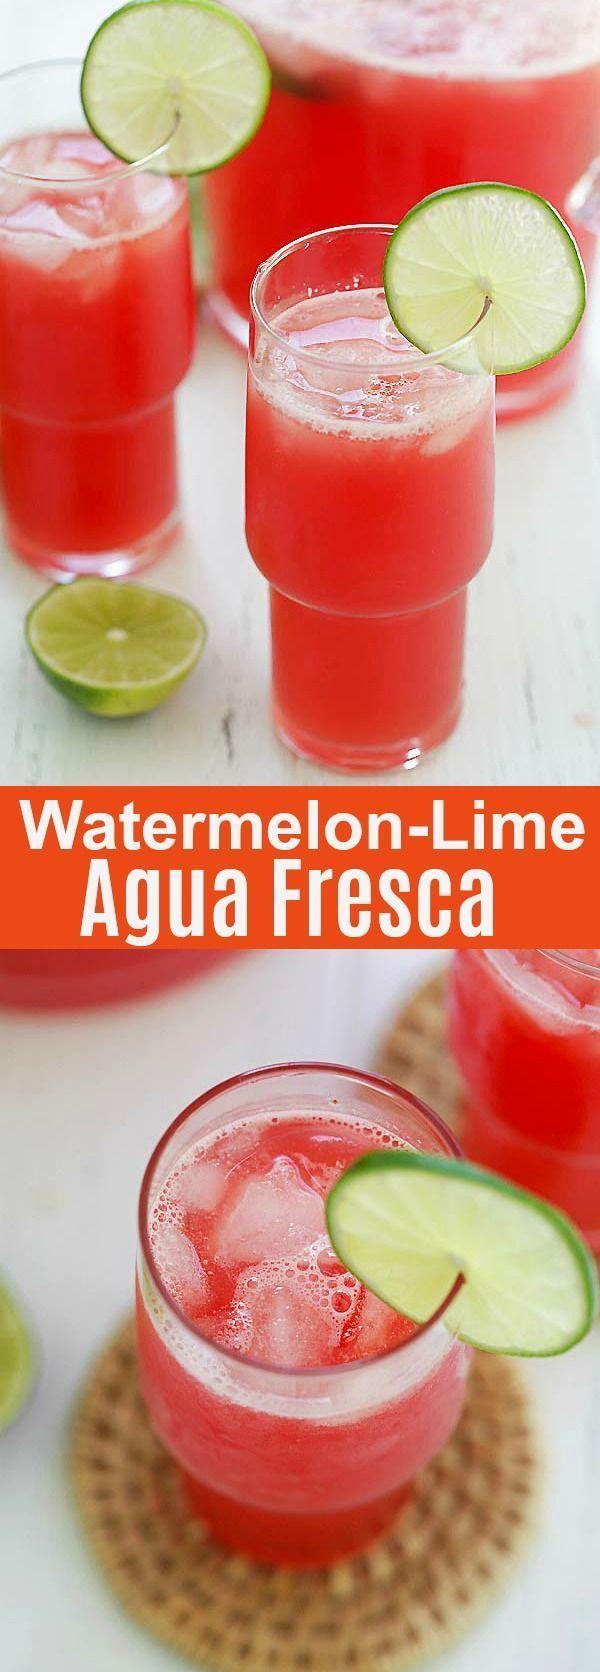 Watermelon Lime Agua Fresca Refreshing Summertime Drink That You Can Enjoy The Entire Season Made With Watermelon Lime Agua Fresca Summertime Drinks Fresca